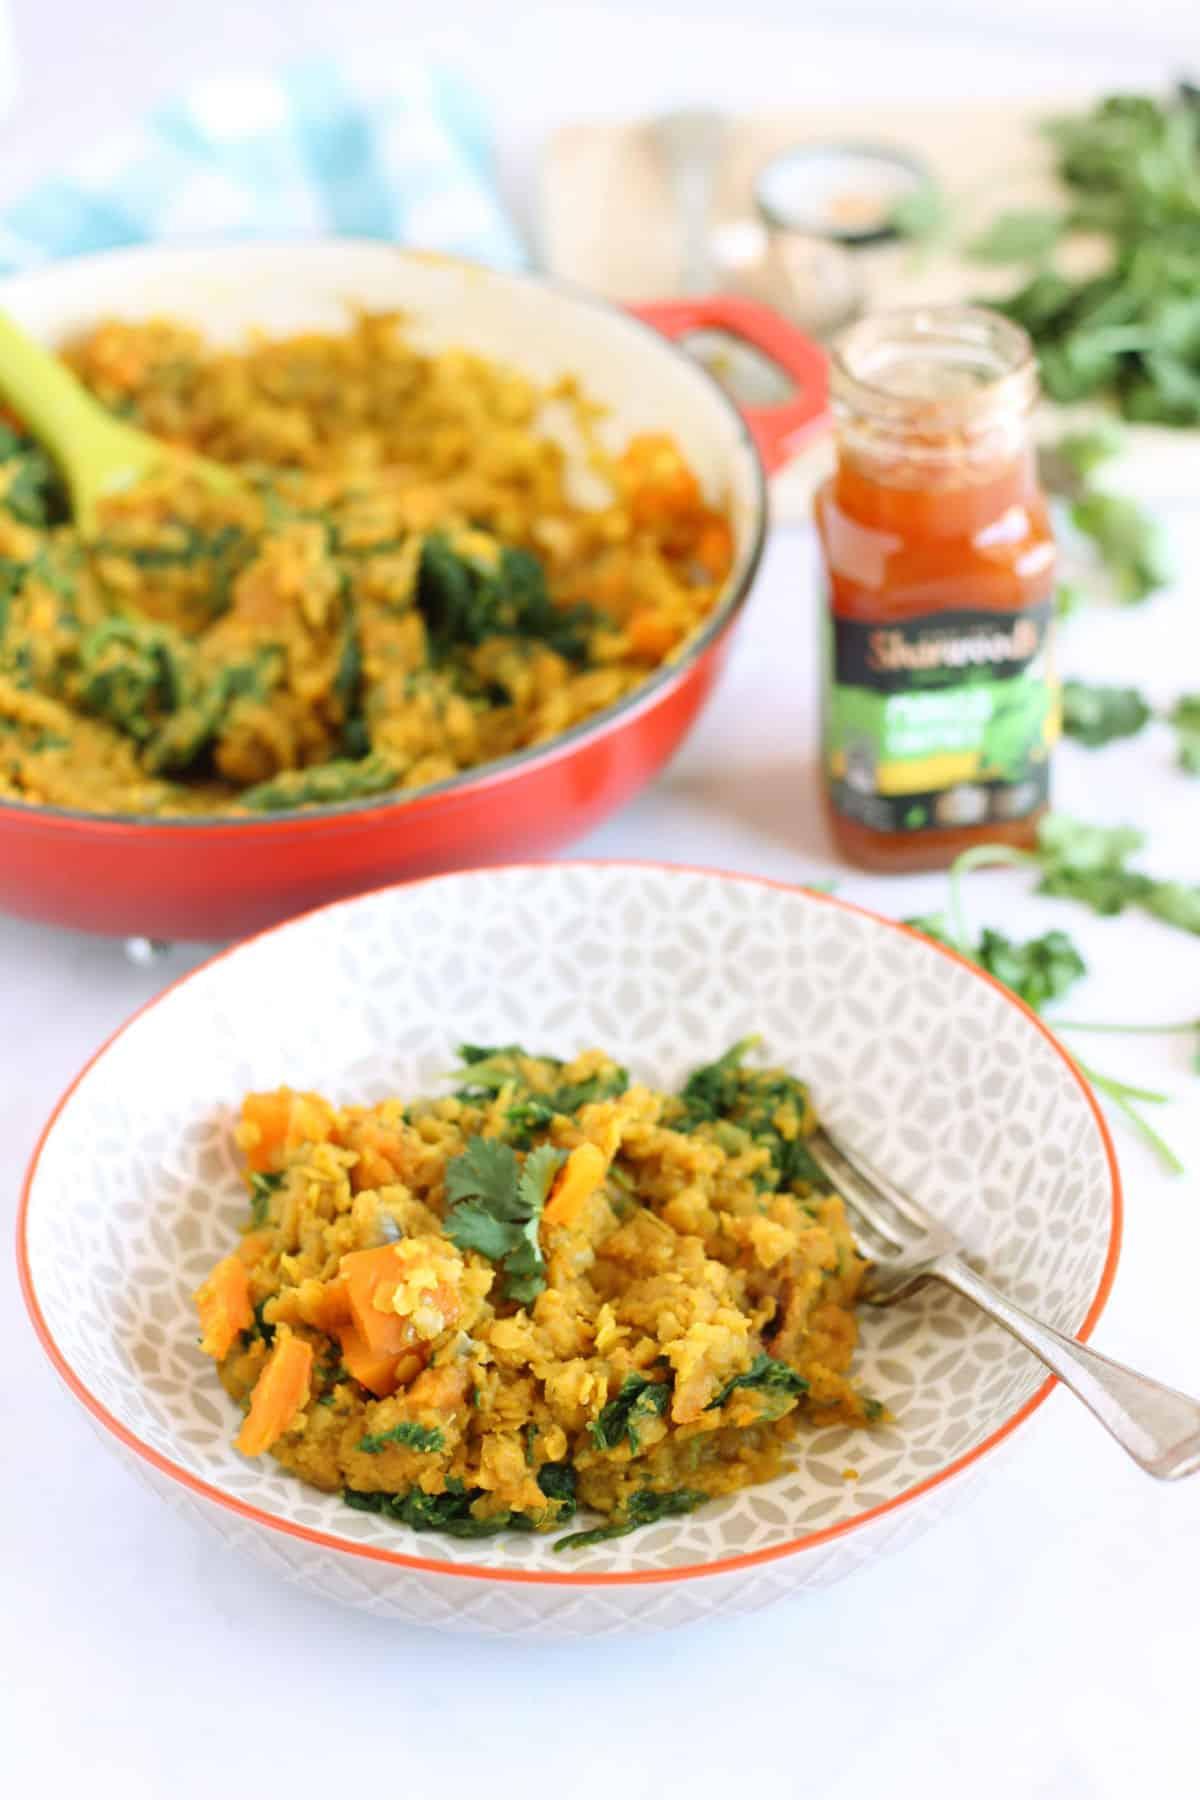 A bowl of lentil curry.